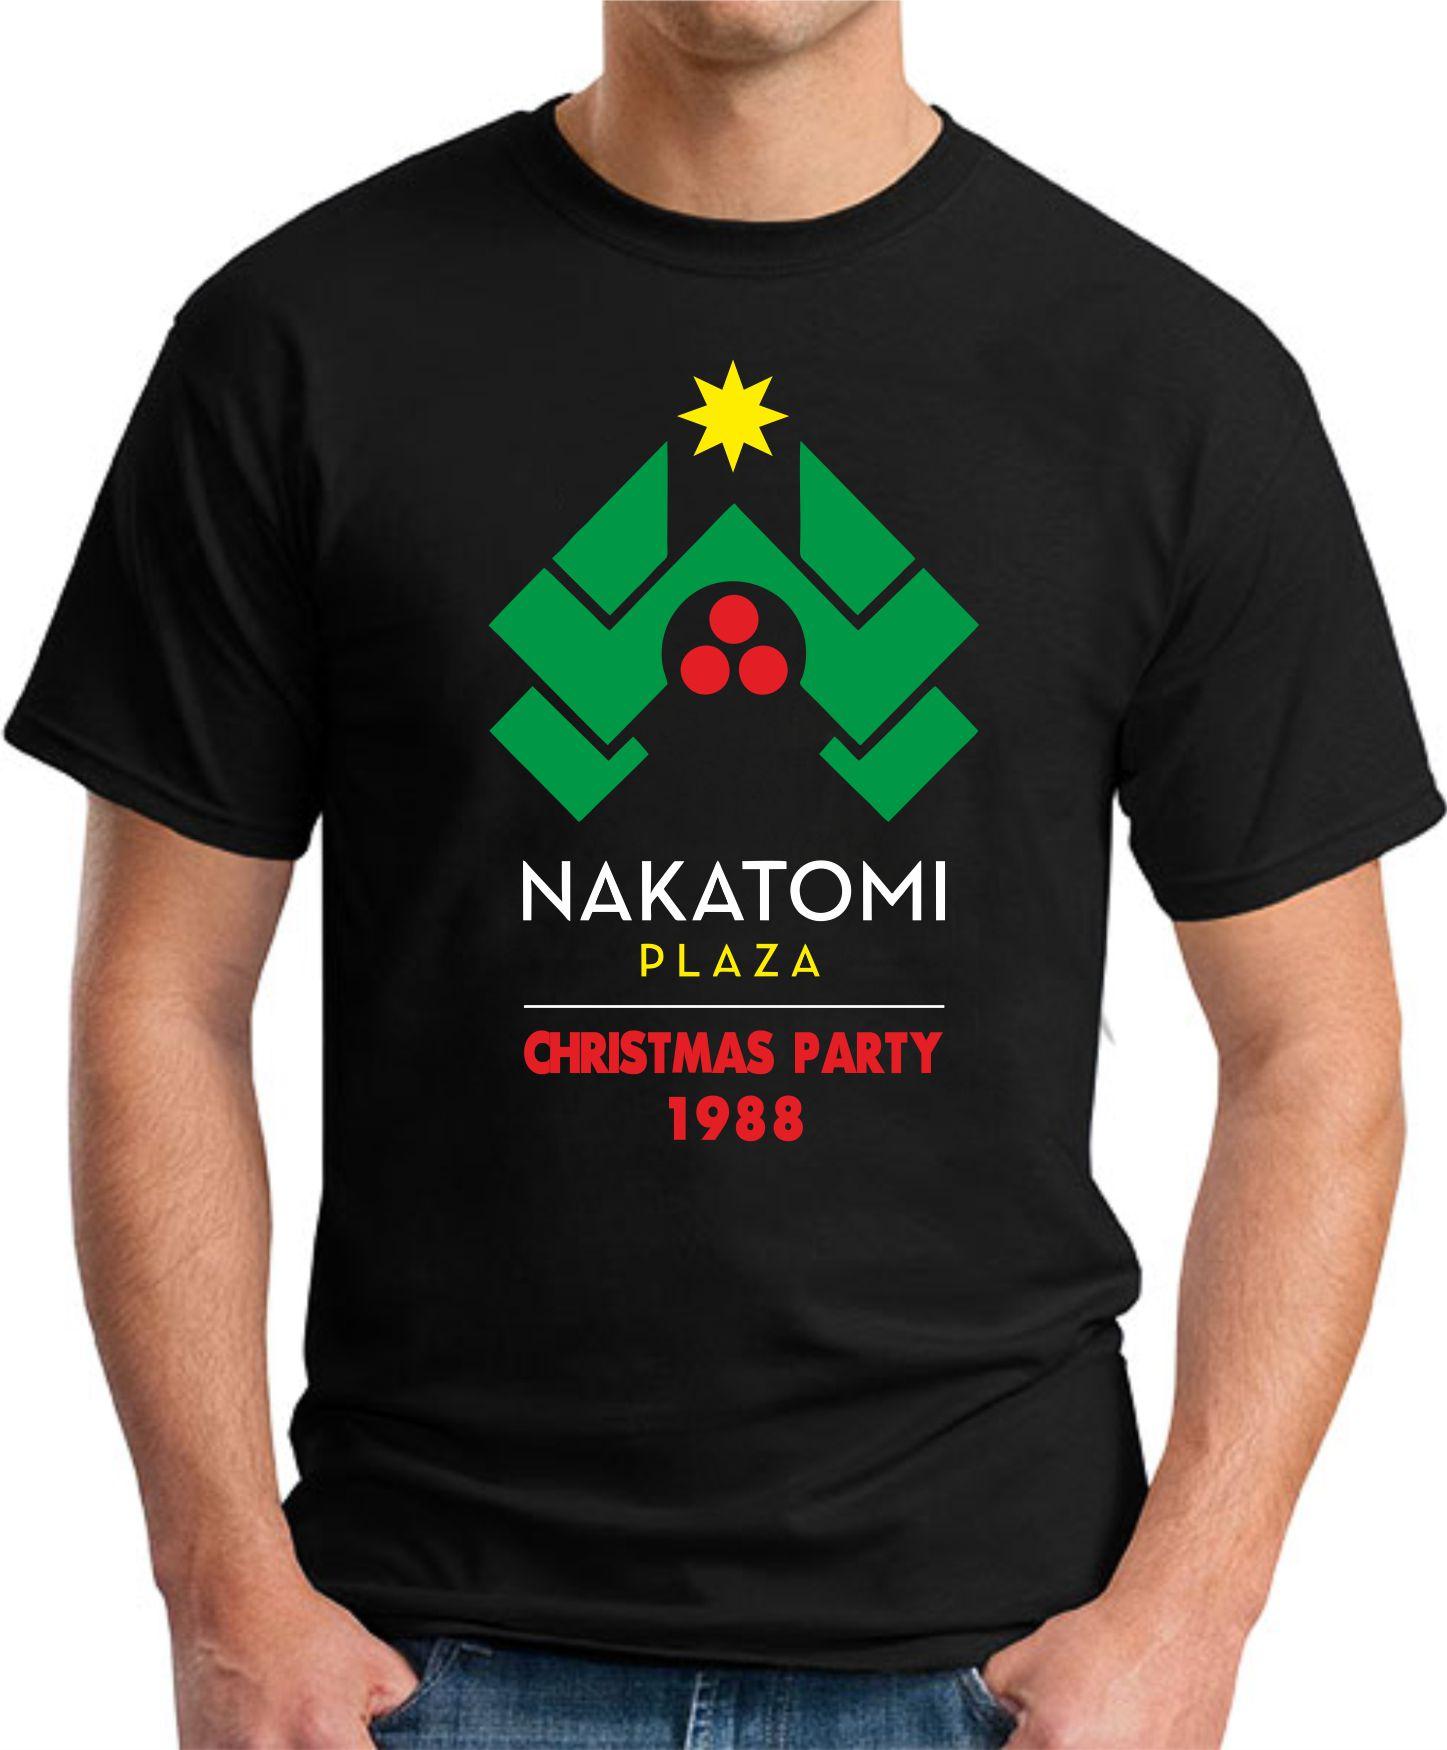 NAKATOMI PLAZA CHRISTMAS PARTY 1988 black